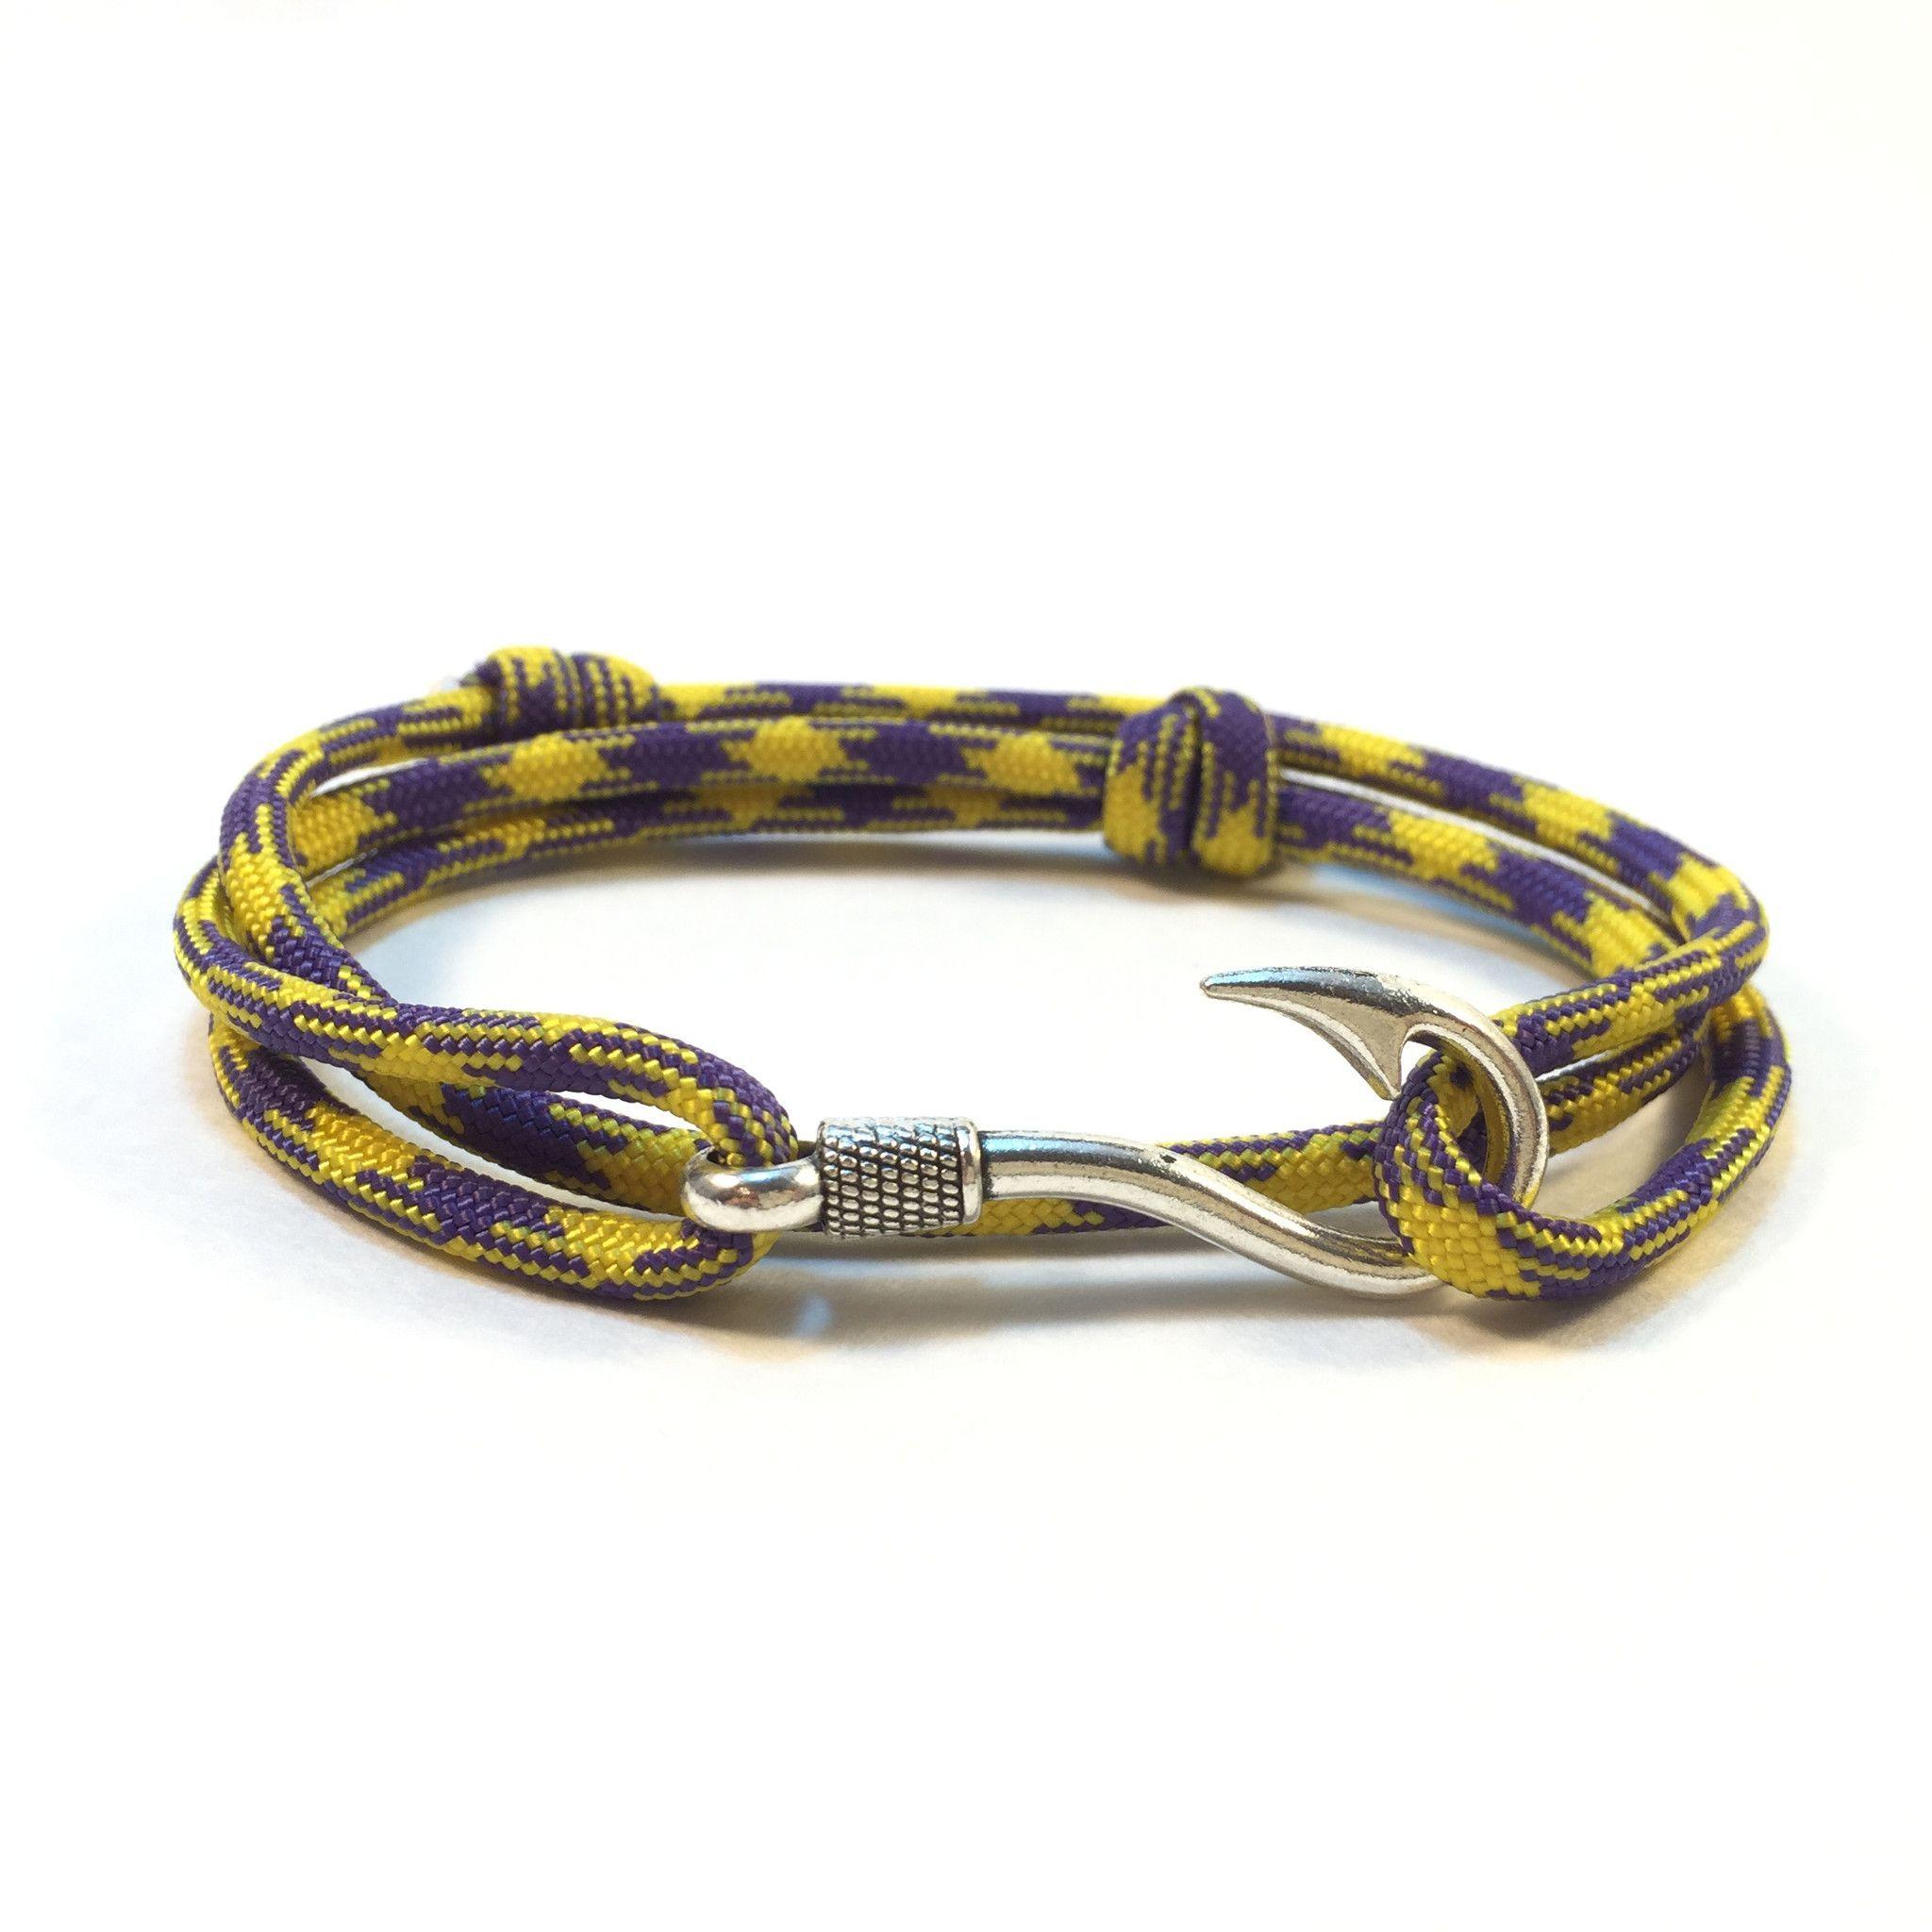 Grape Vine Fish Hook Adjustable Paracord Bracelet